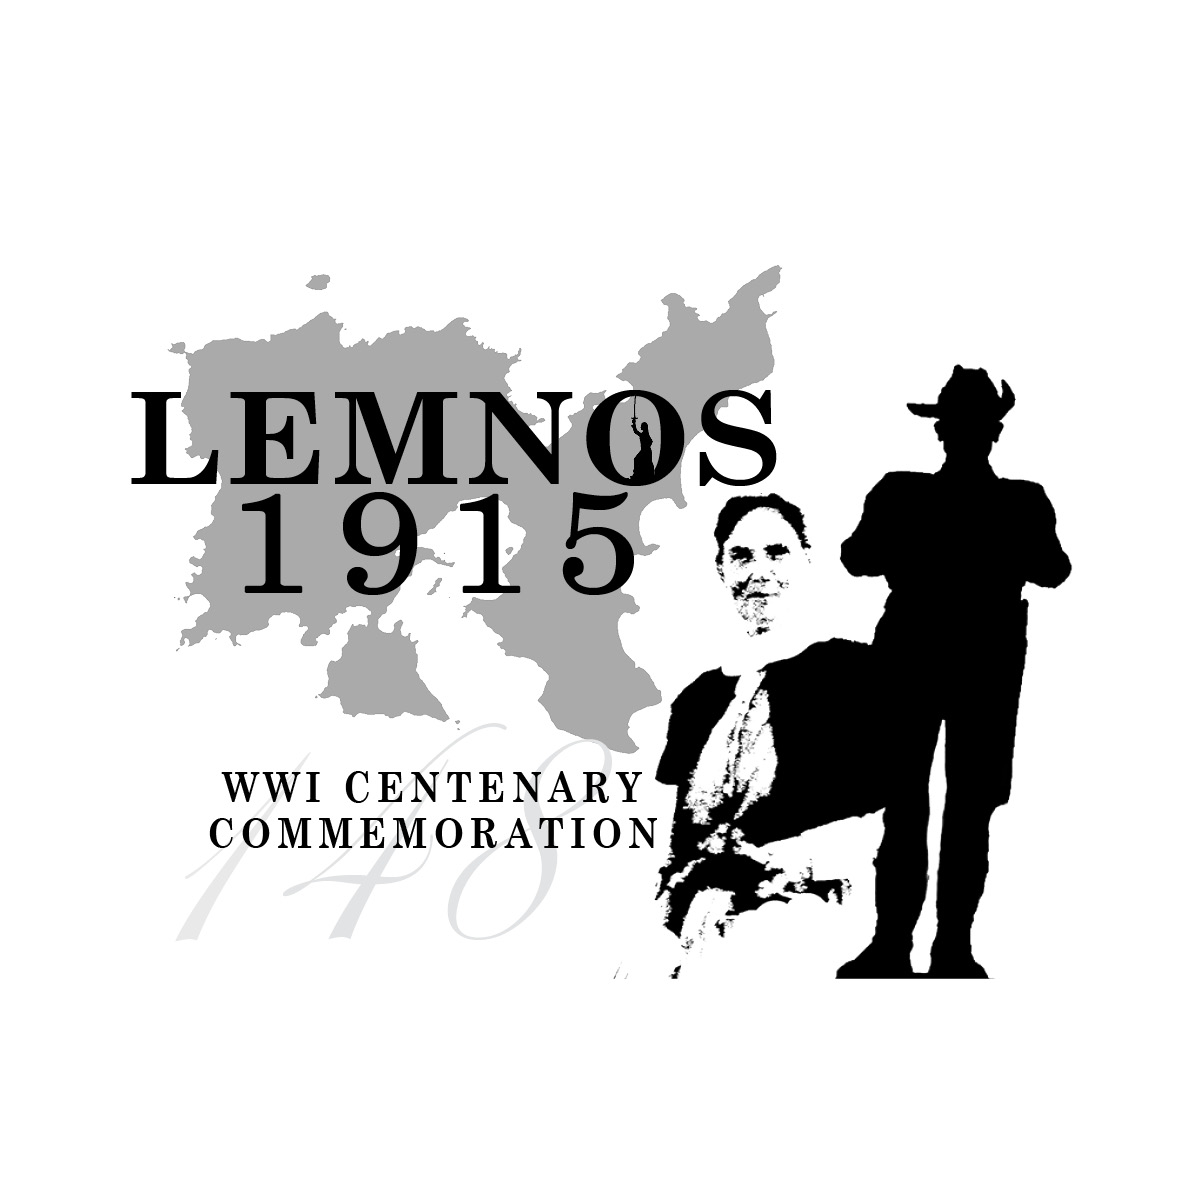 LEMNOS 1915 WWI LOGO.jpg